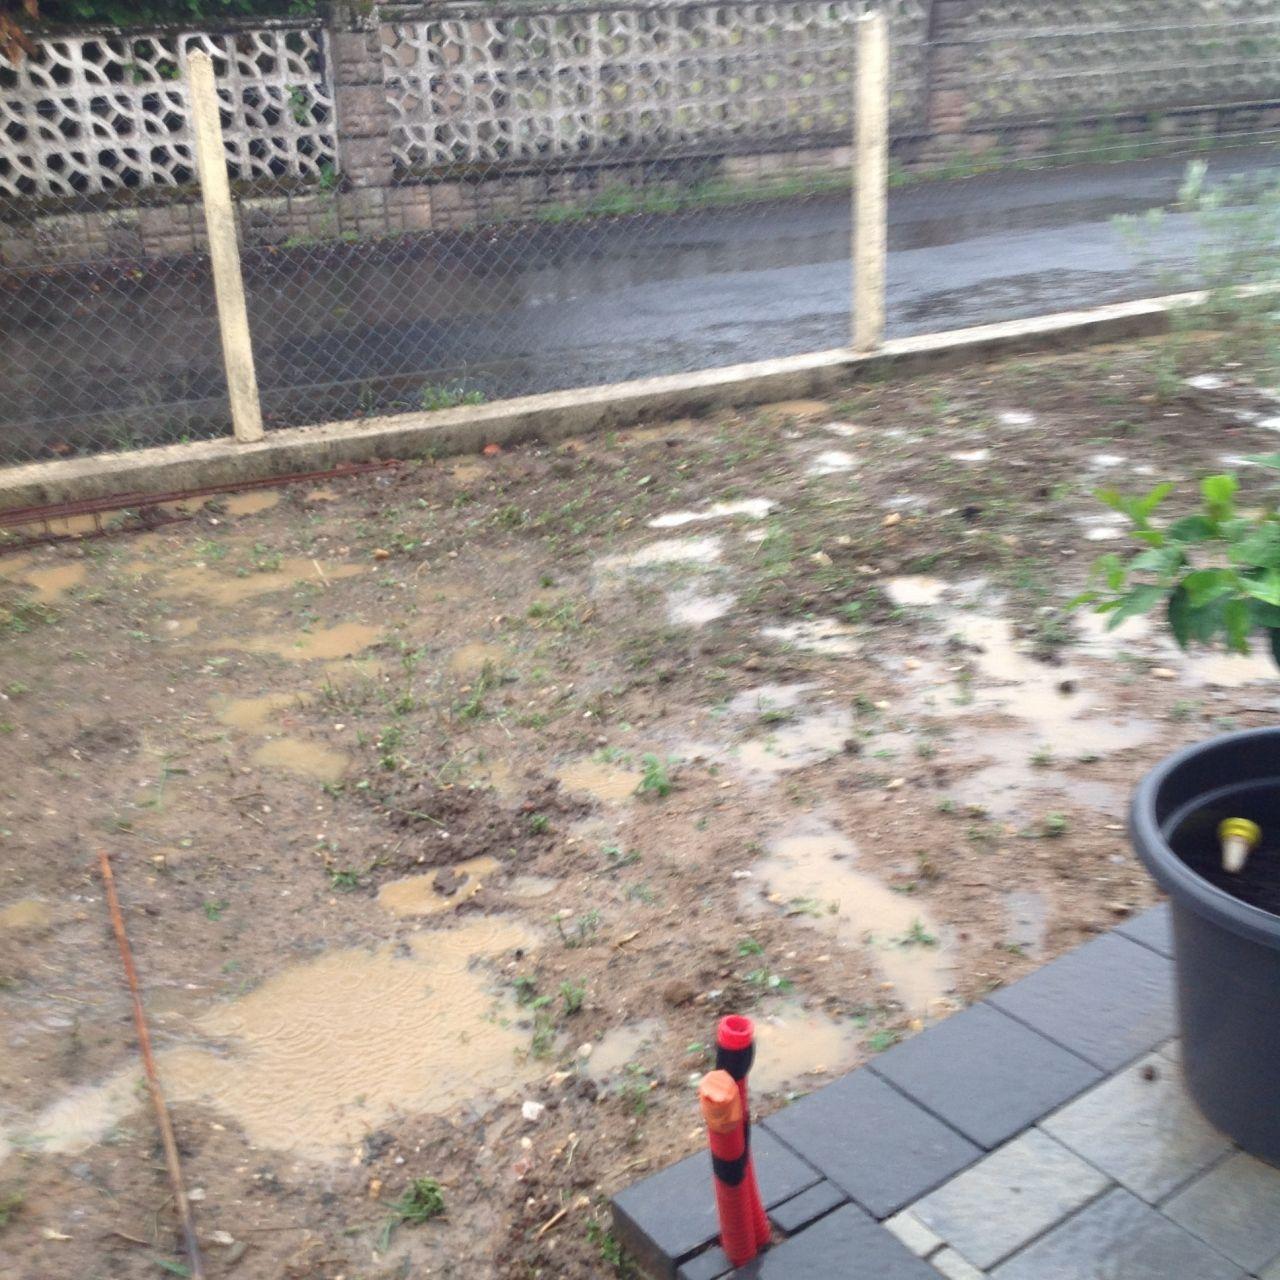 Notre petit jardin exotique st sulpice tarn - Petit jardin ru ...